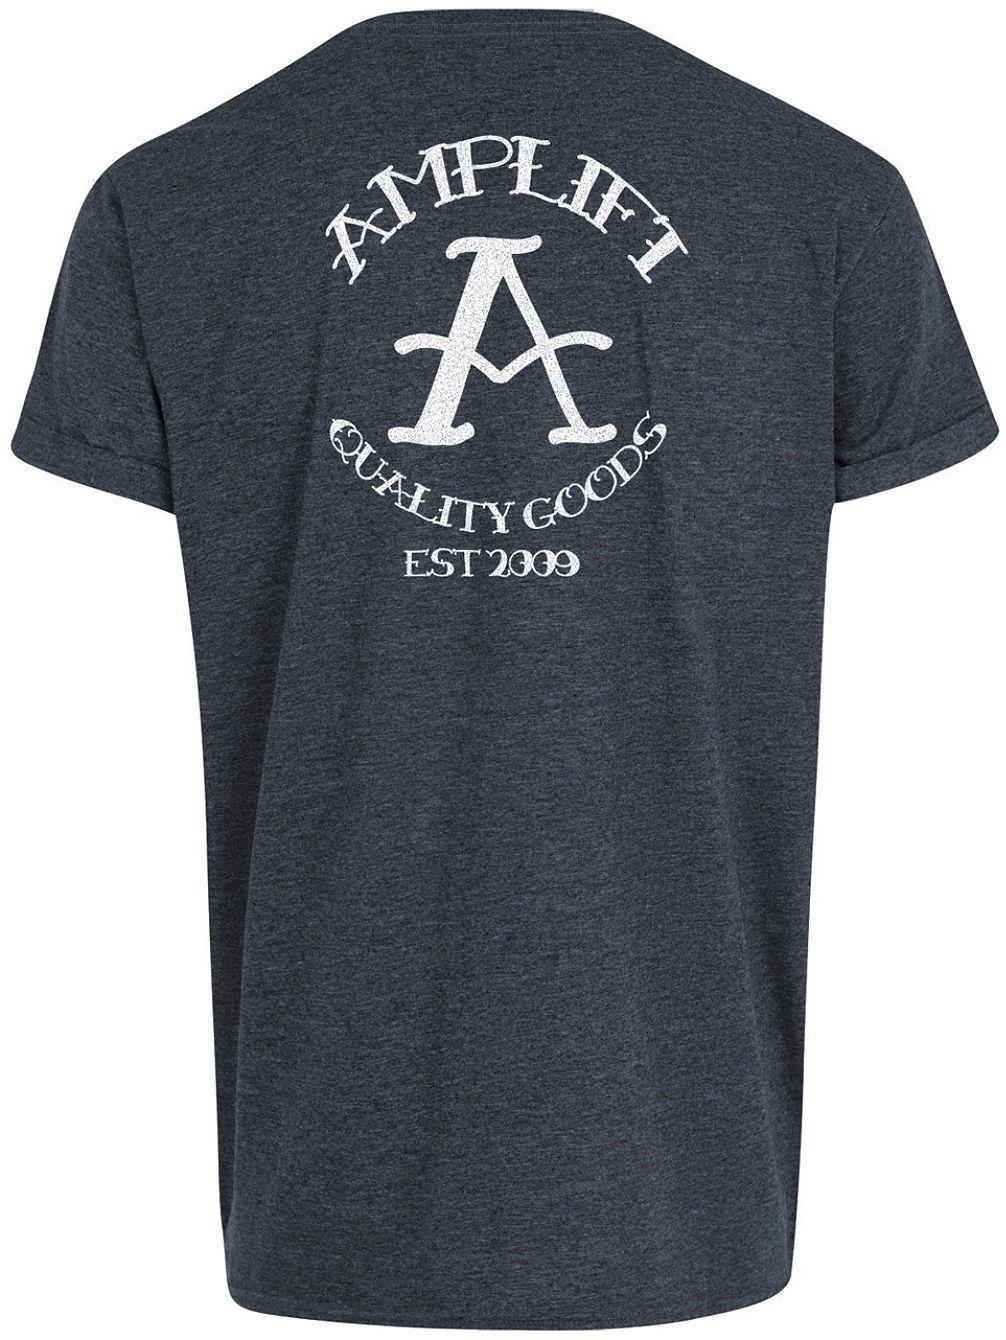 amplifi-quality-goods-t-shirt